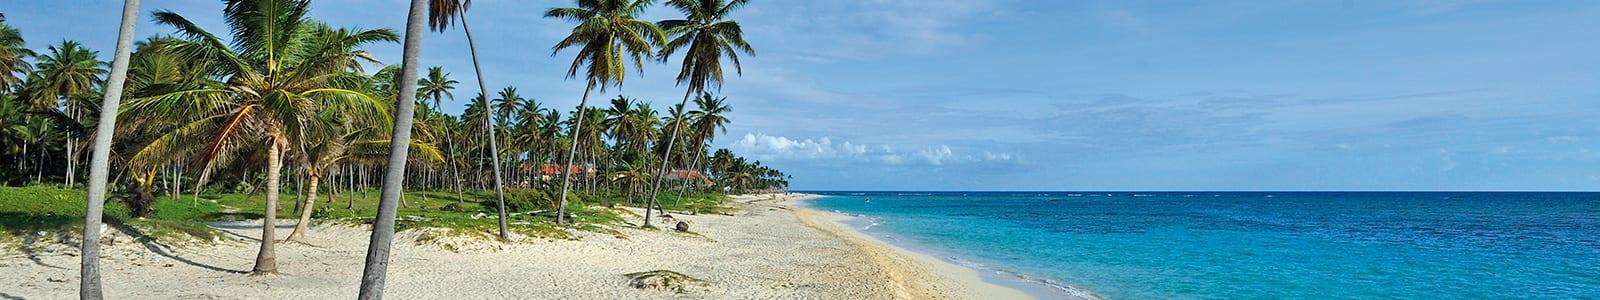 Resort La Romana